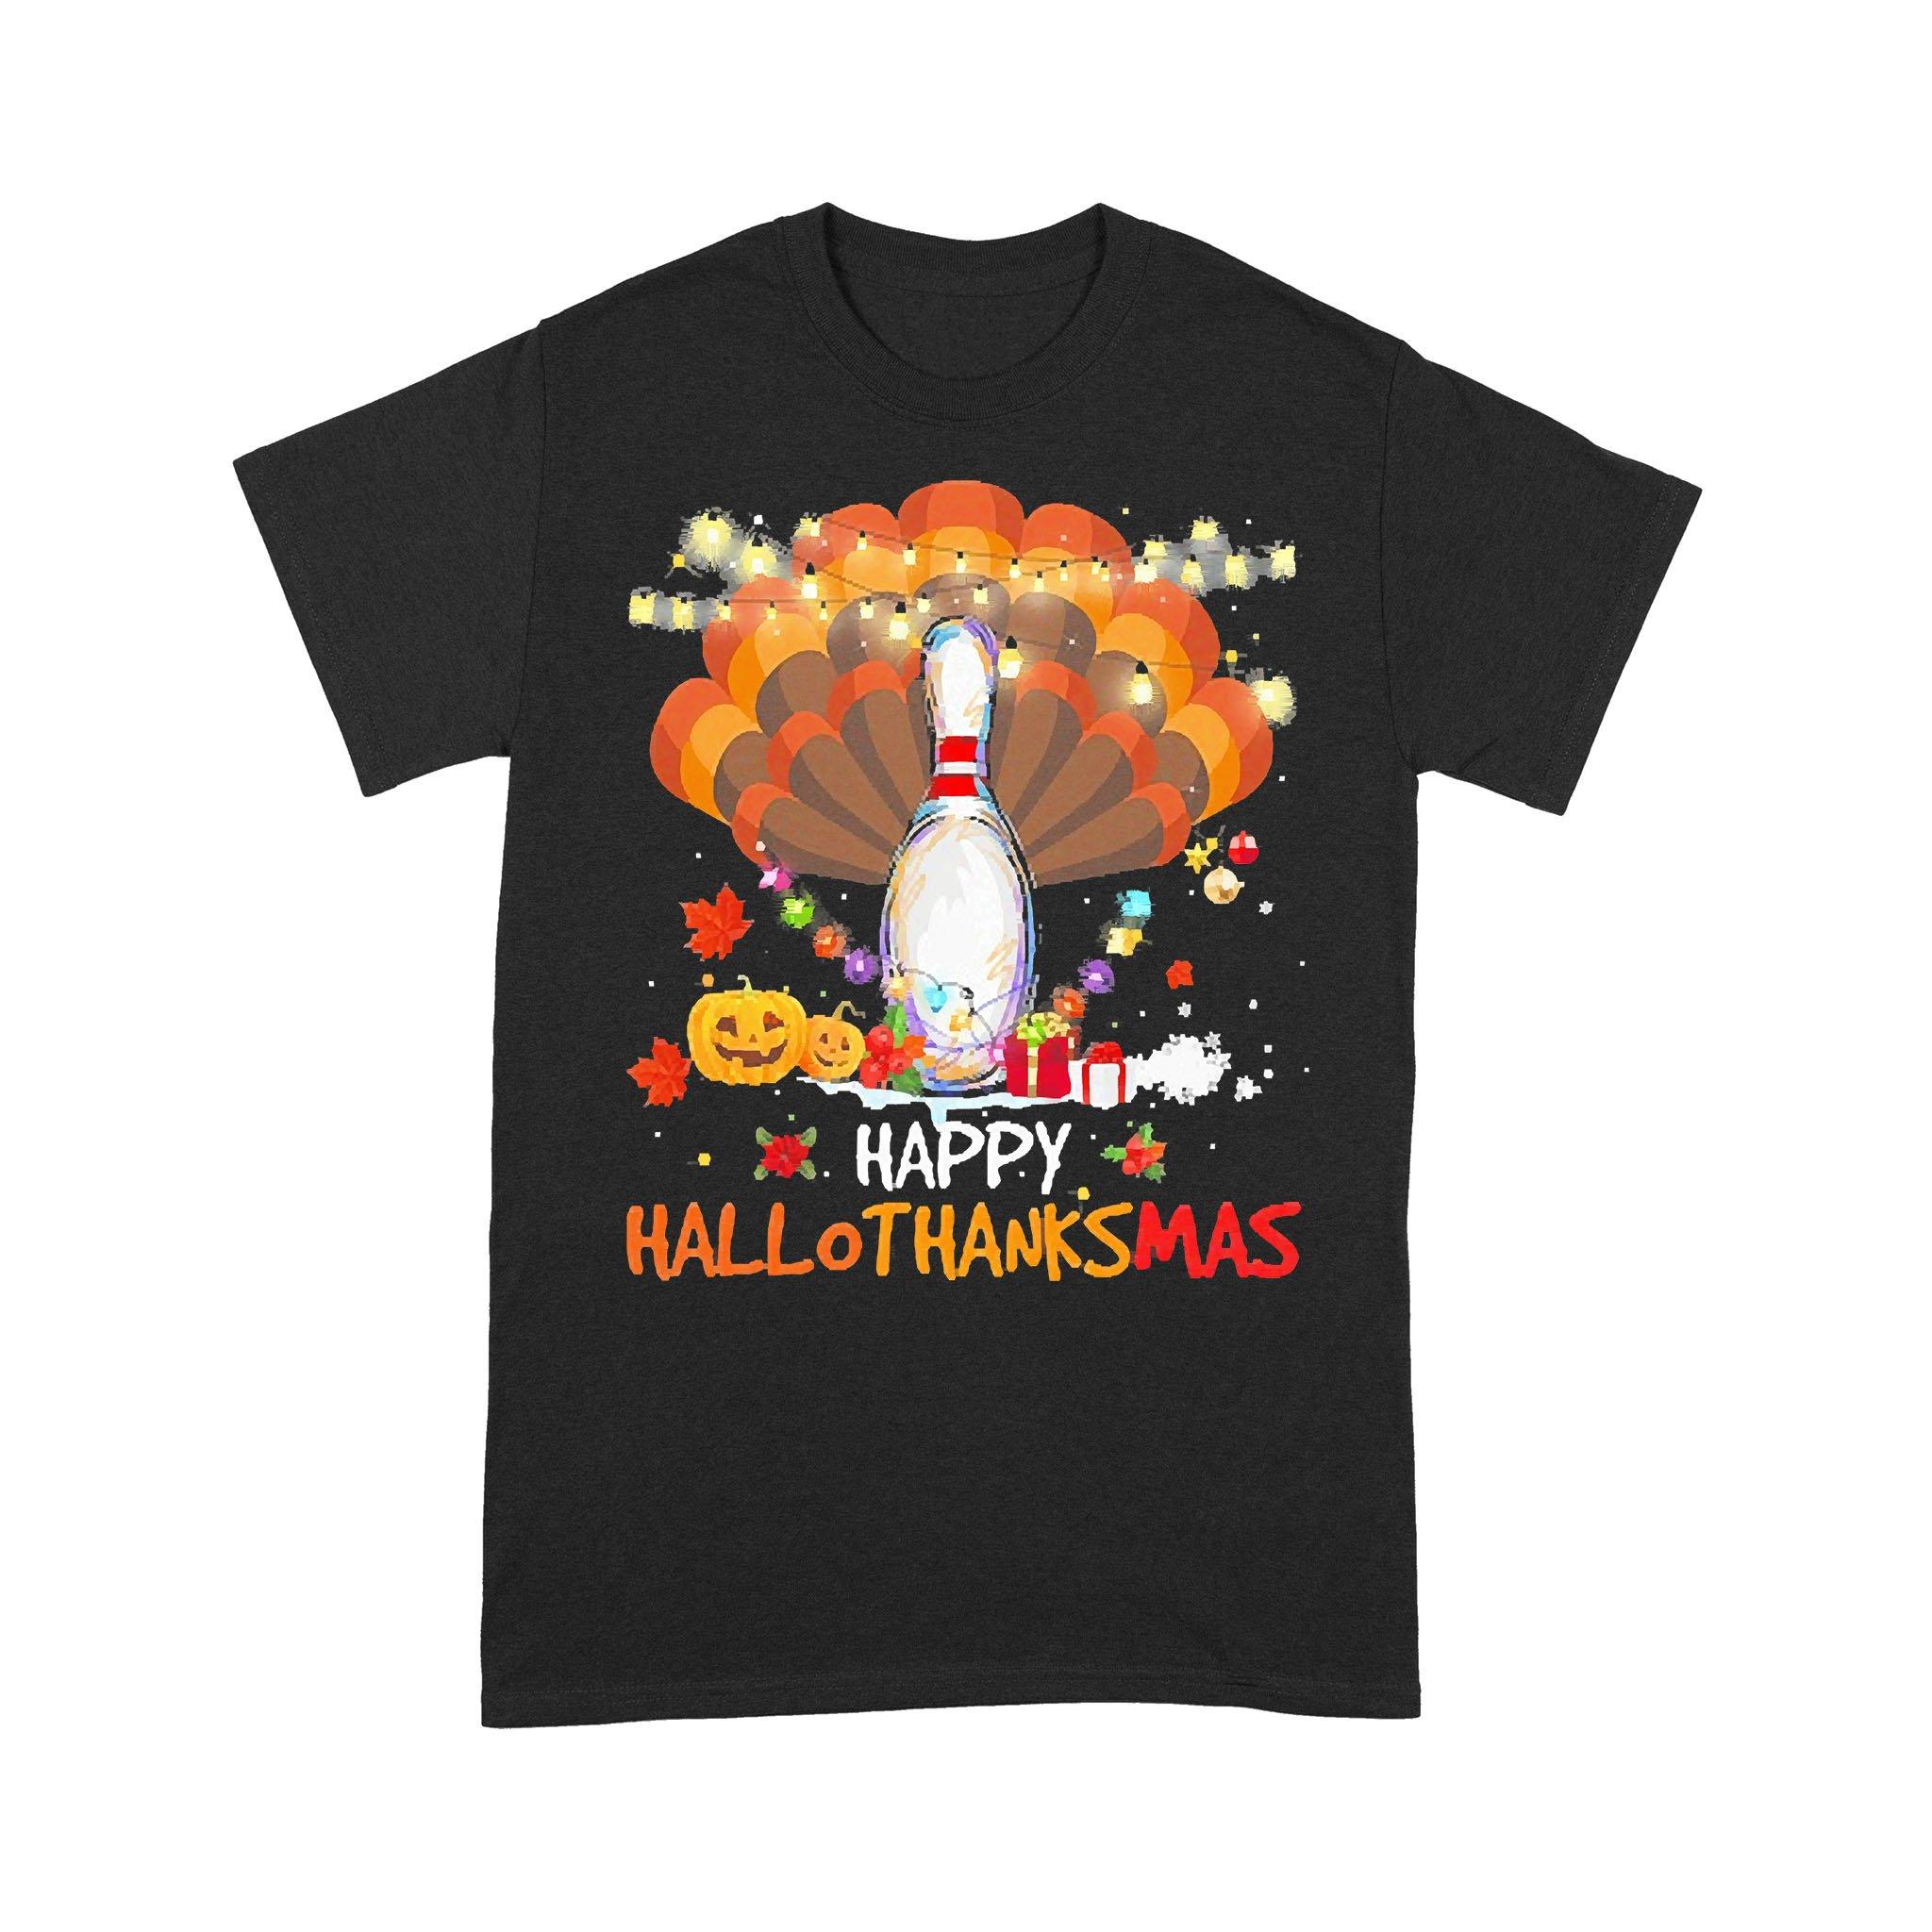 Bowling Turkey Happy Hallothanksmas T-shirt